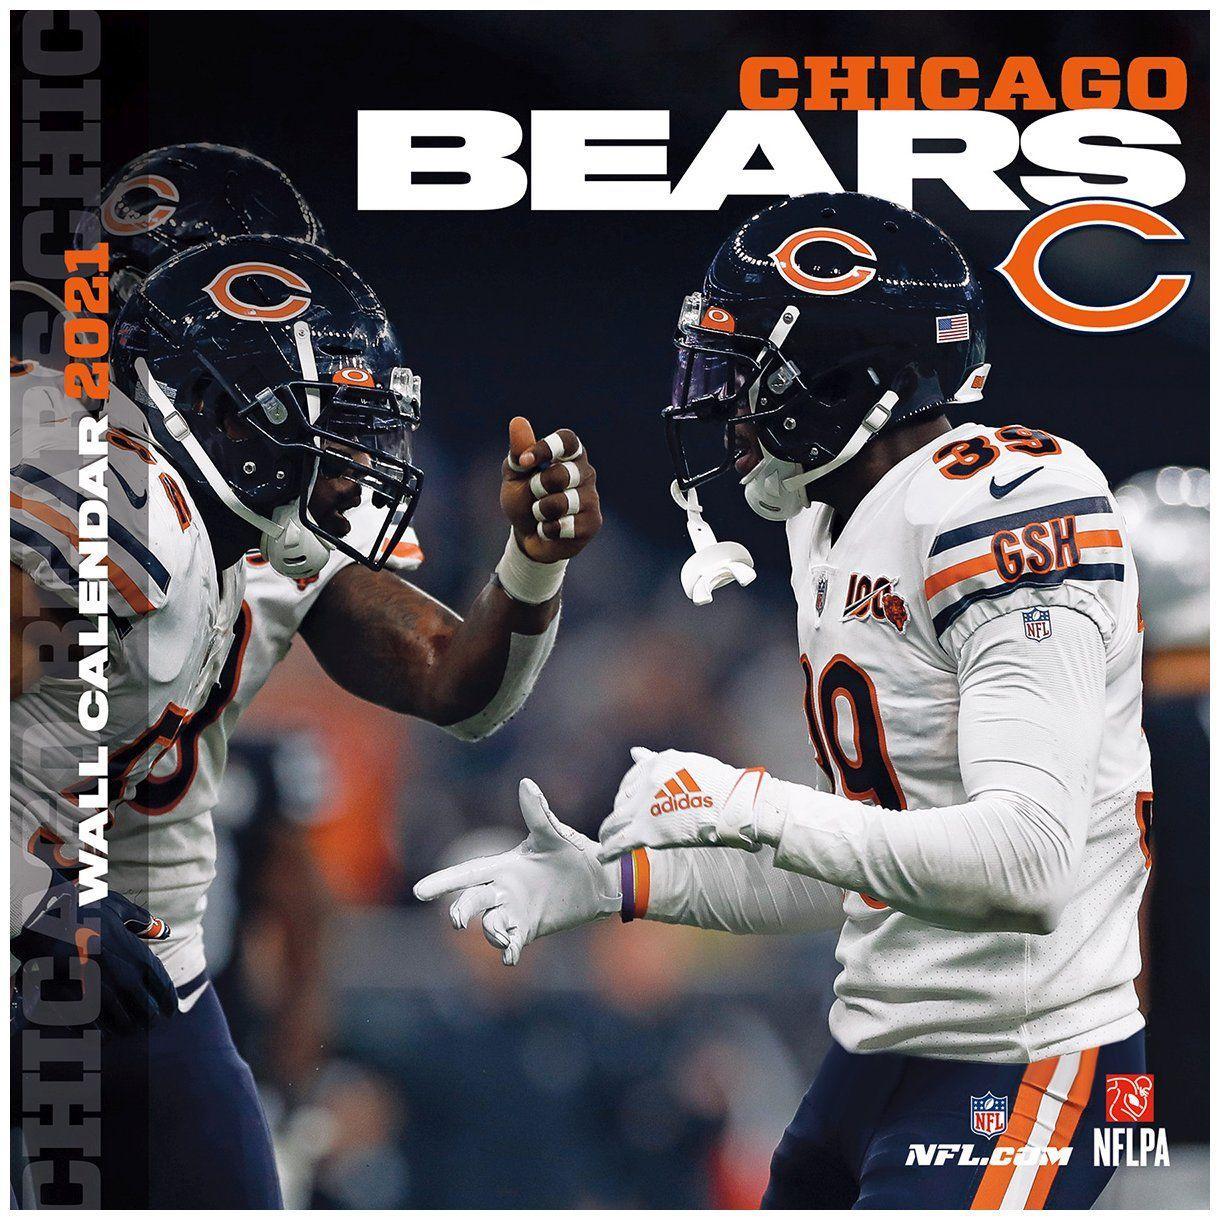 amfoo - Turner NFL 30x30cm Wand-Kalender 2021 Chicago Bears